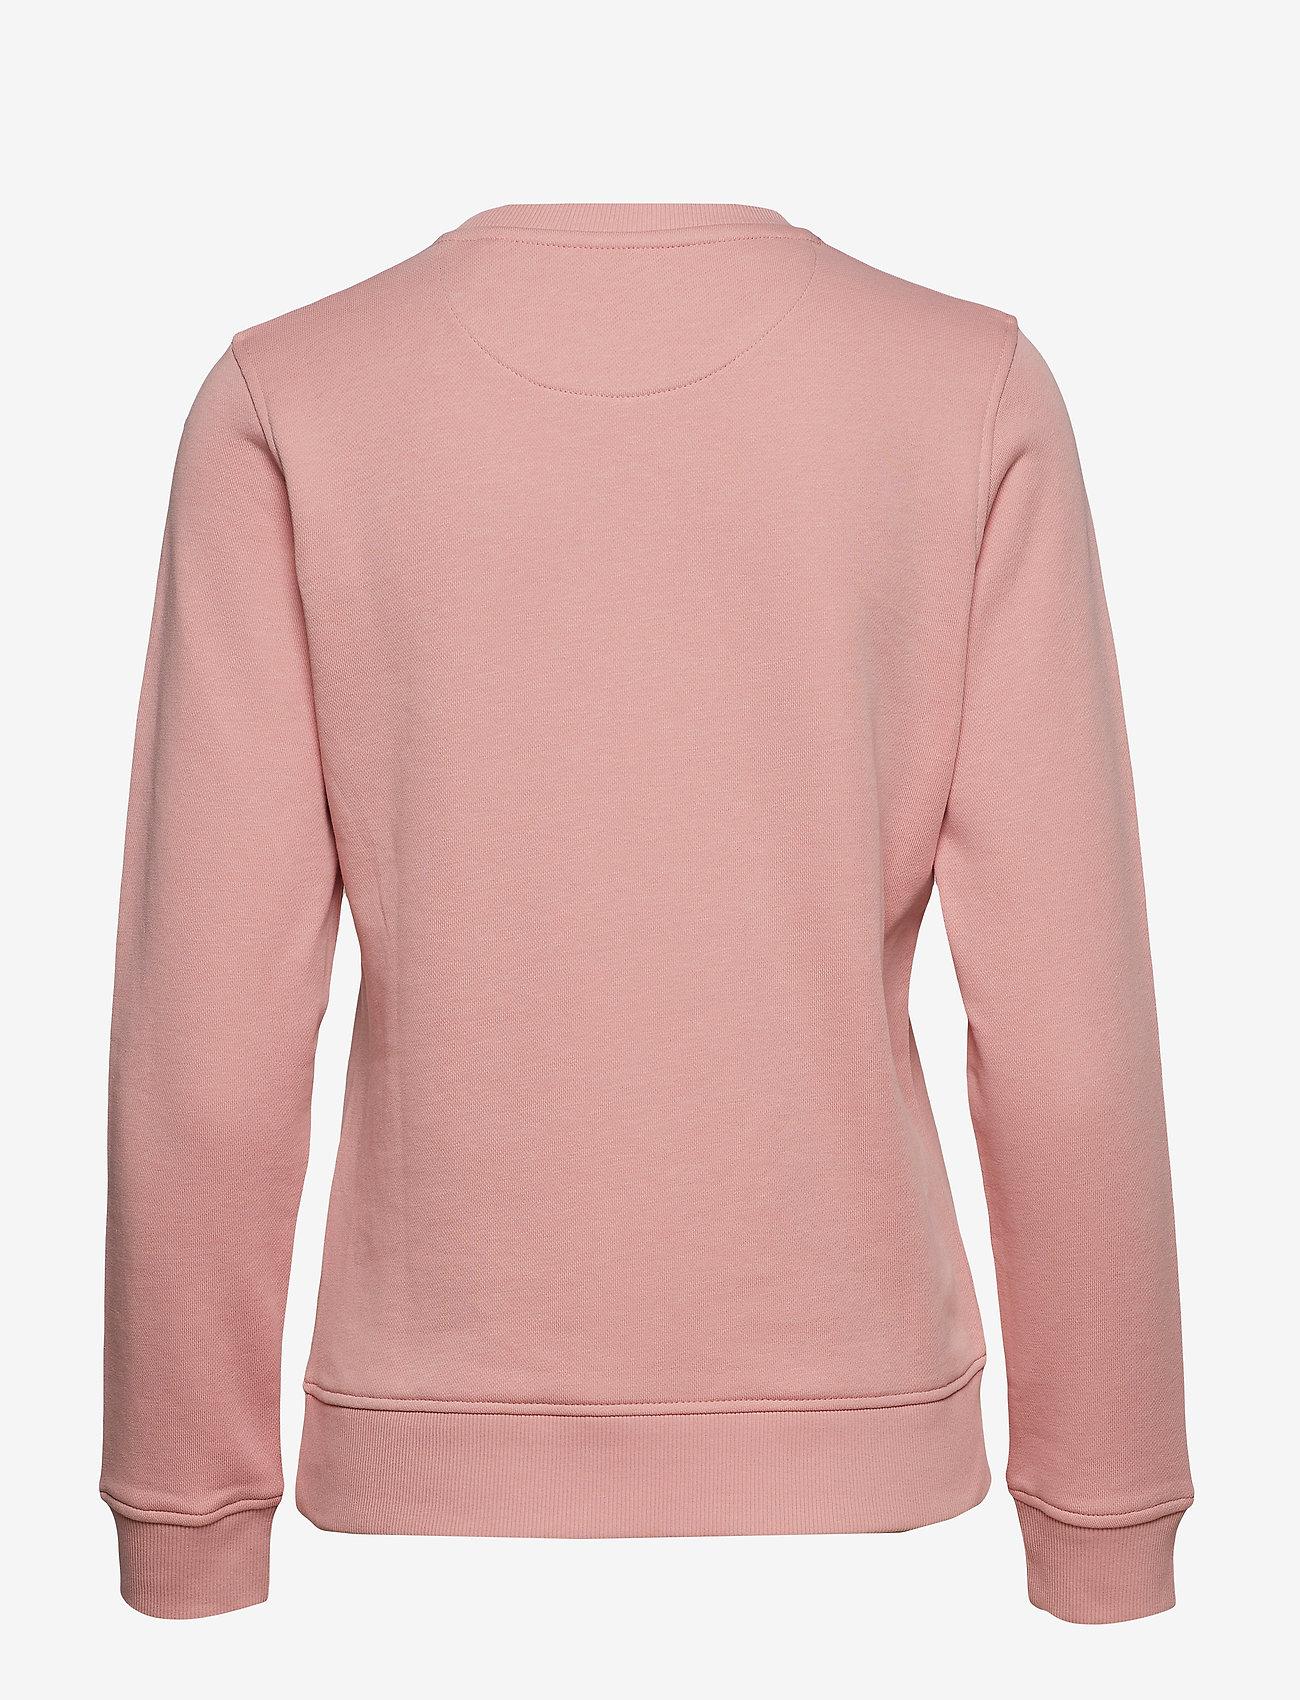 Gant - GANT LOCK UP C-NECK SWEAT - sweatshirts - summer rose